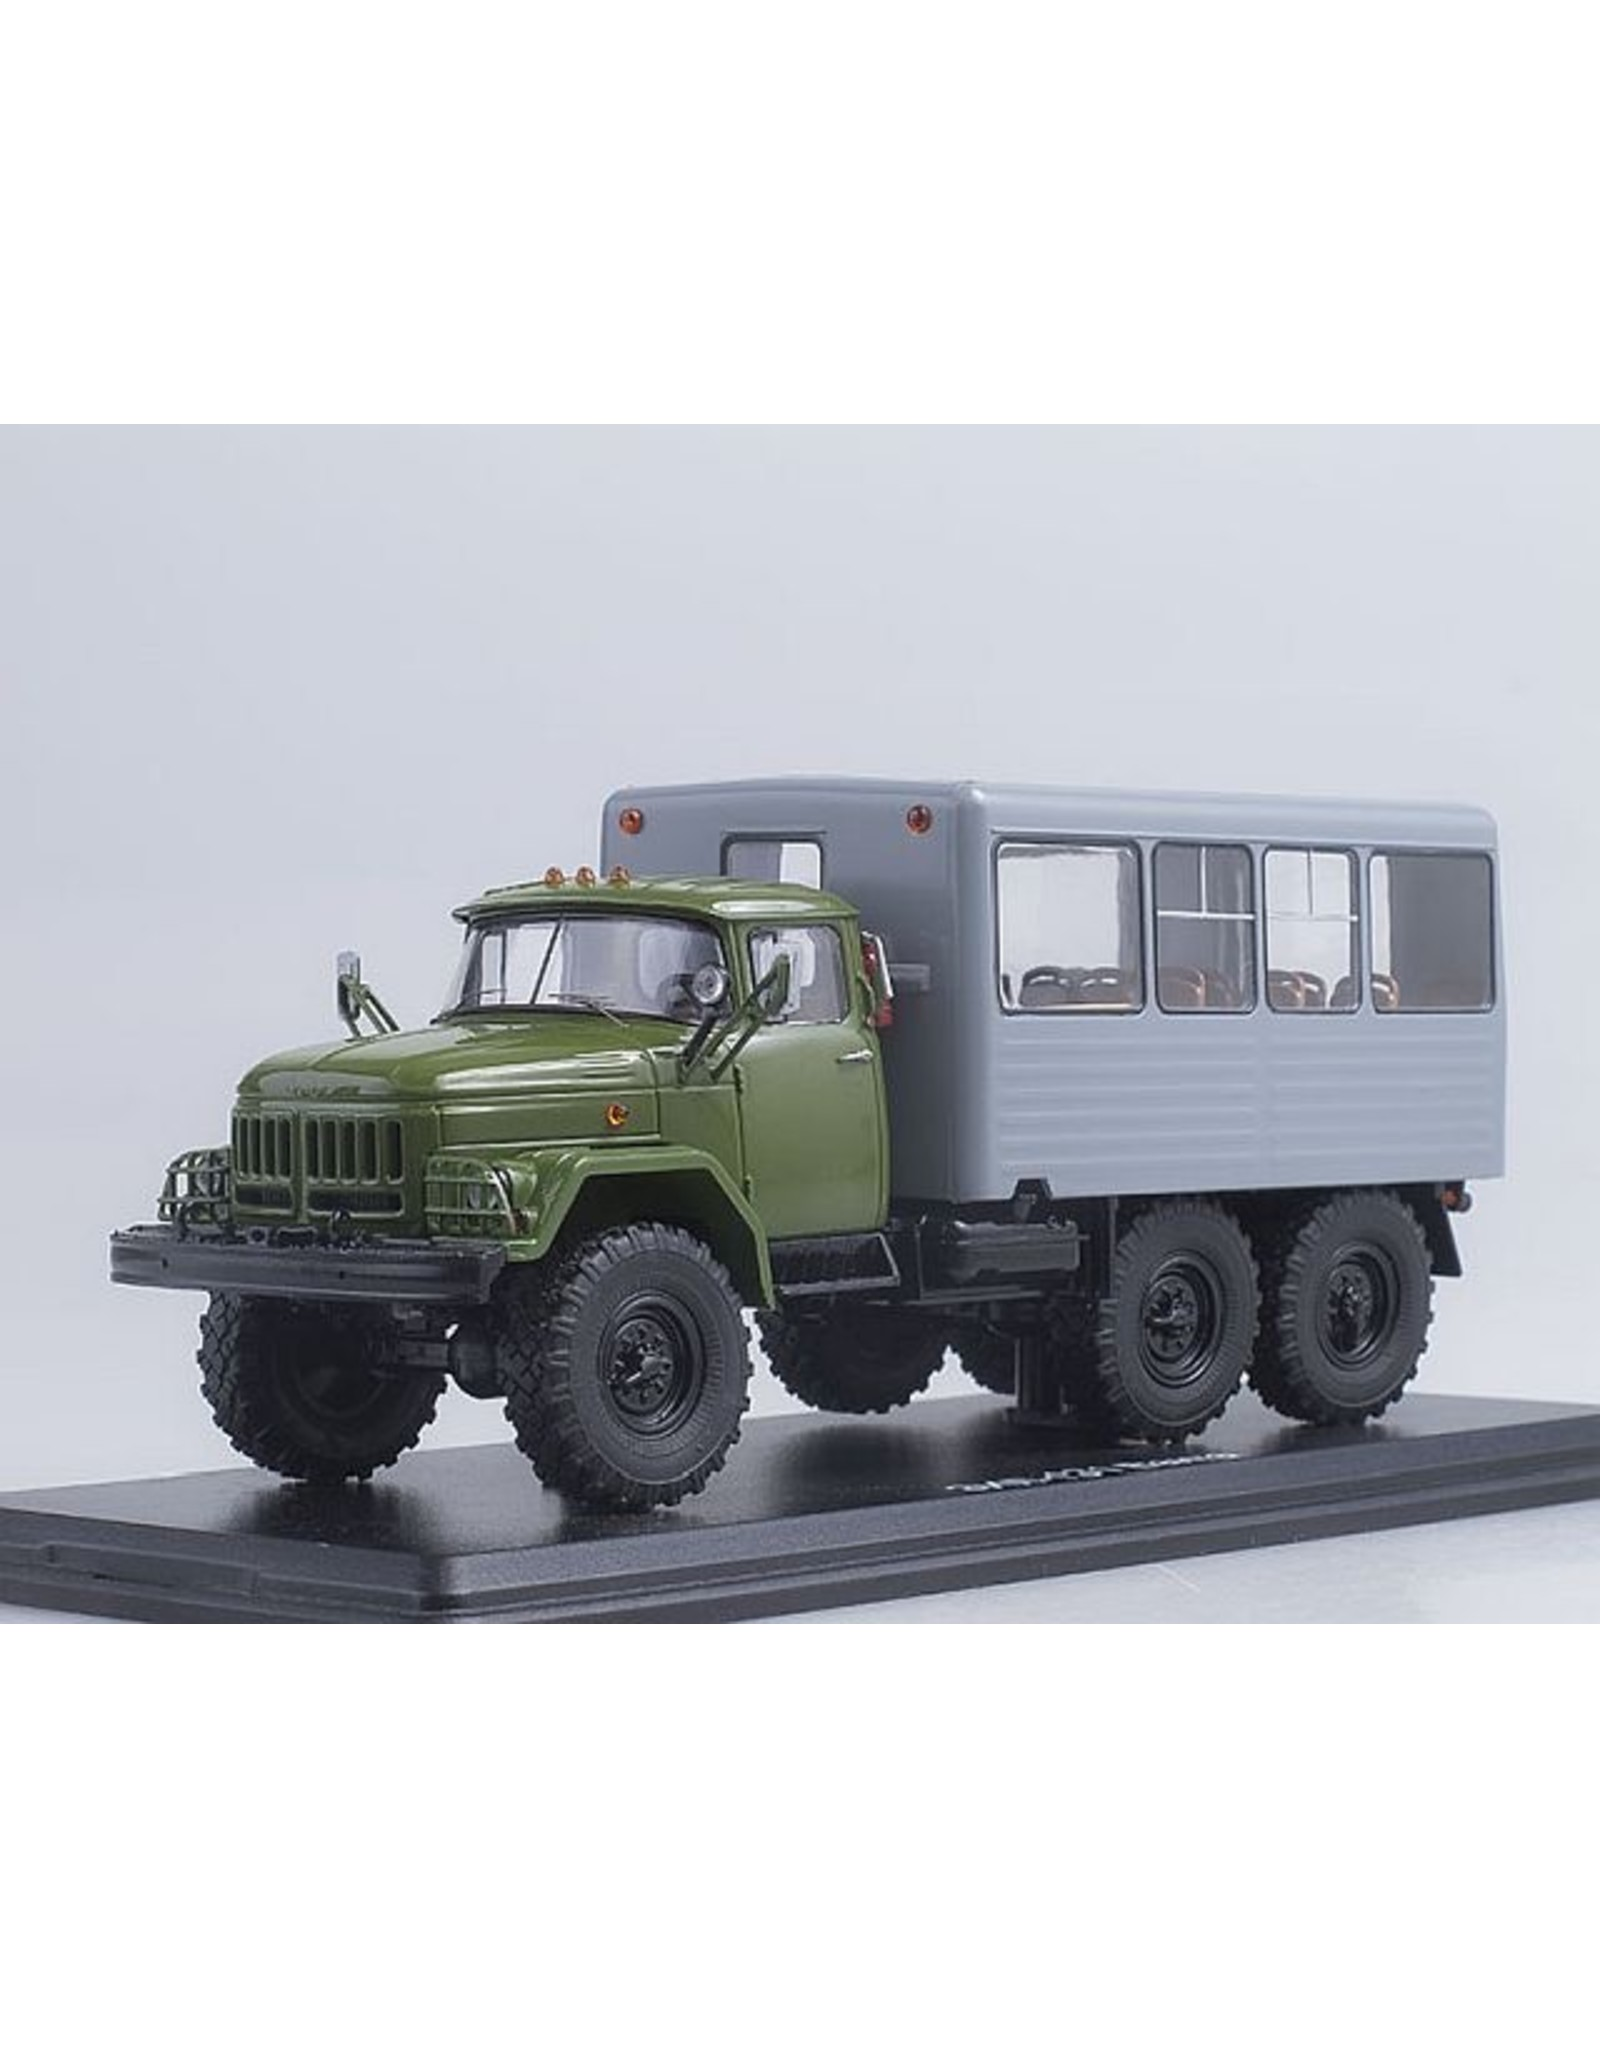 ZiL BUS TRUCK ZiL-131(khaki/grey)